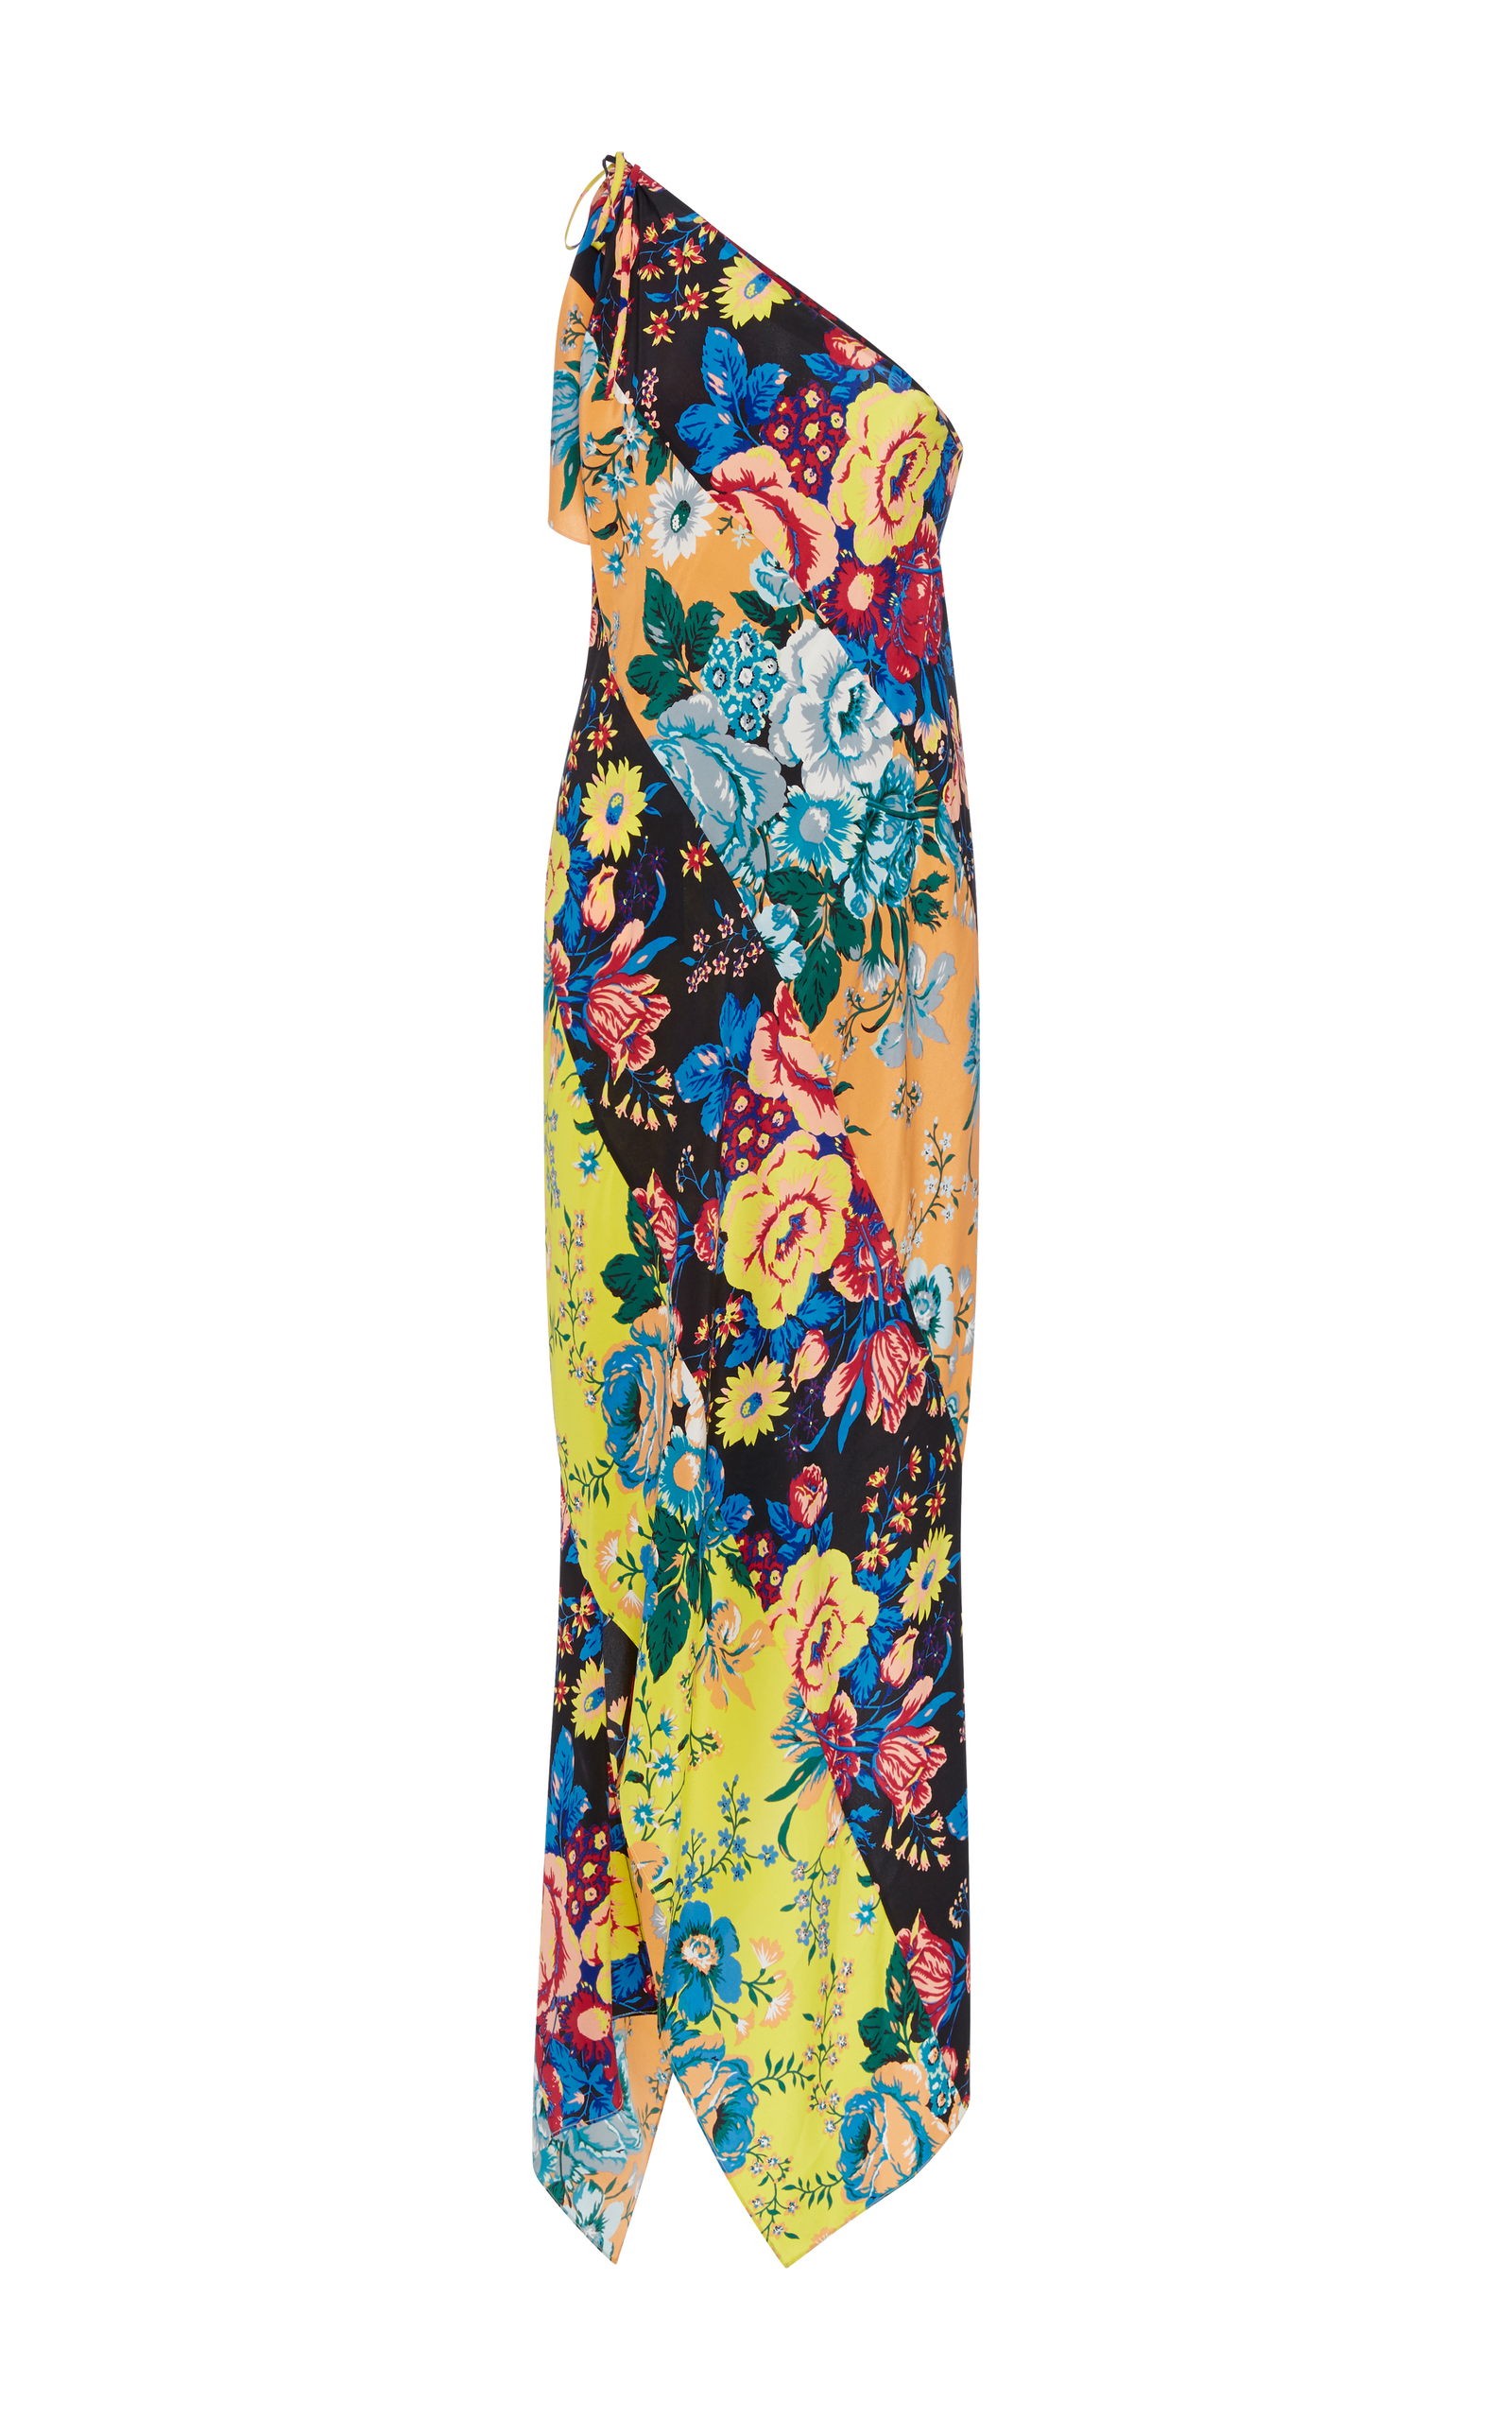 769854a0031 Diane von FurstenbergOne Shoulder Asymmetric Hem Dress. CLOSE. Loading